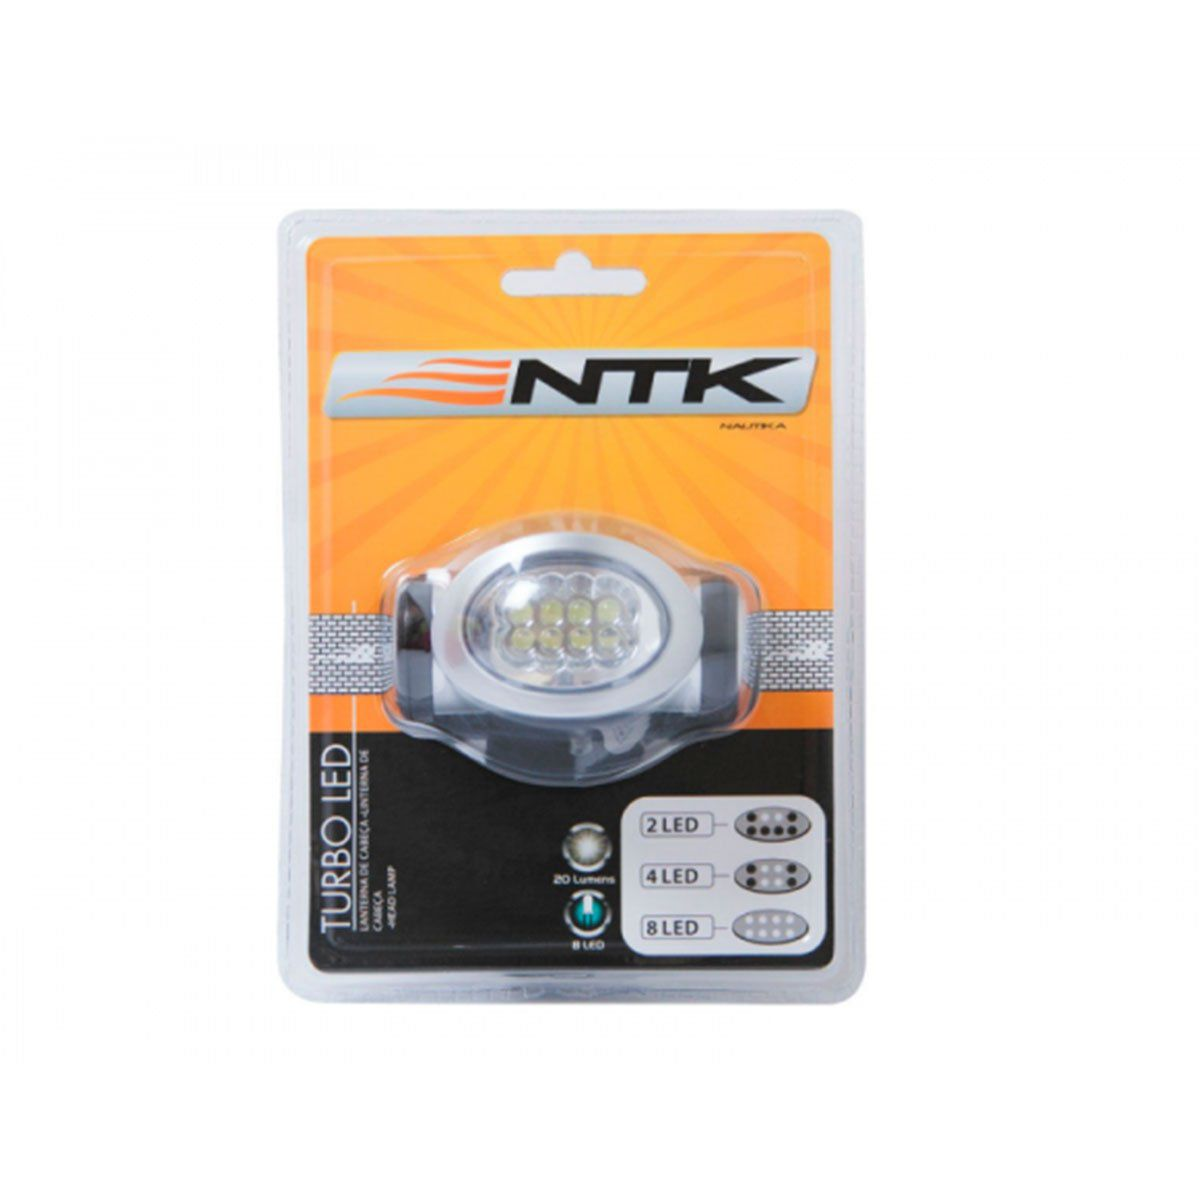 Lanterna de Cabeça Nautika Turbo Led 20 Lumens